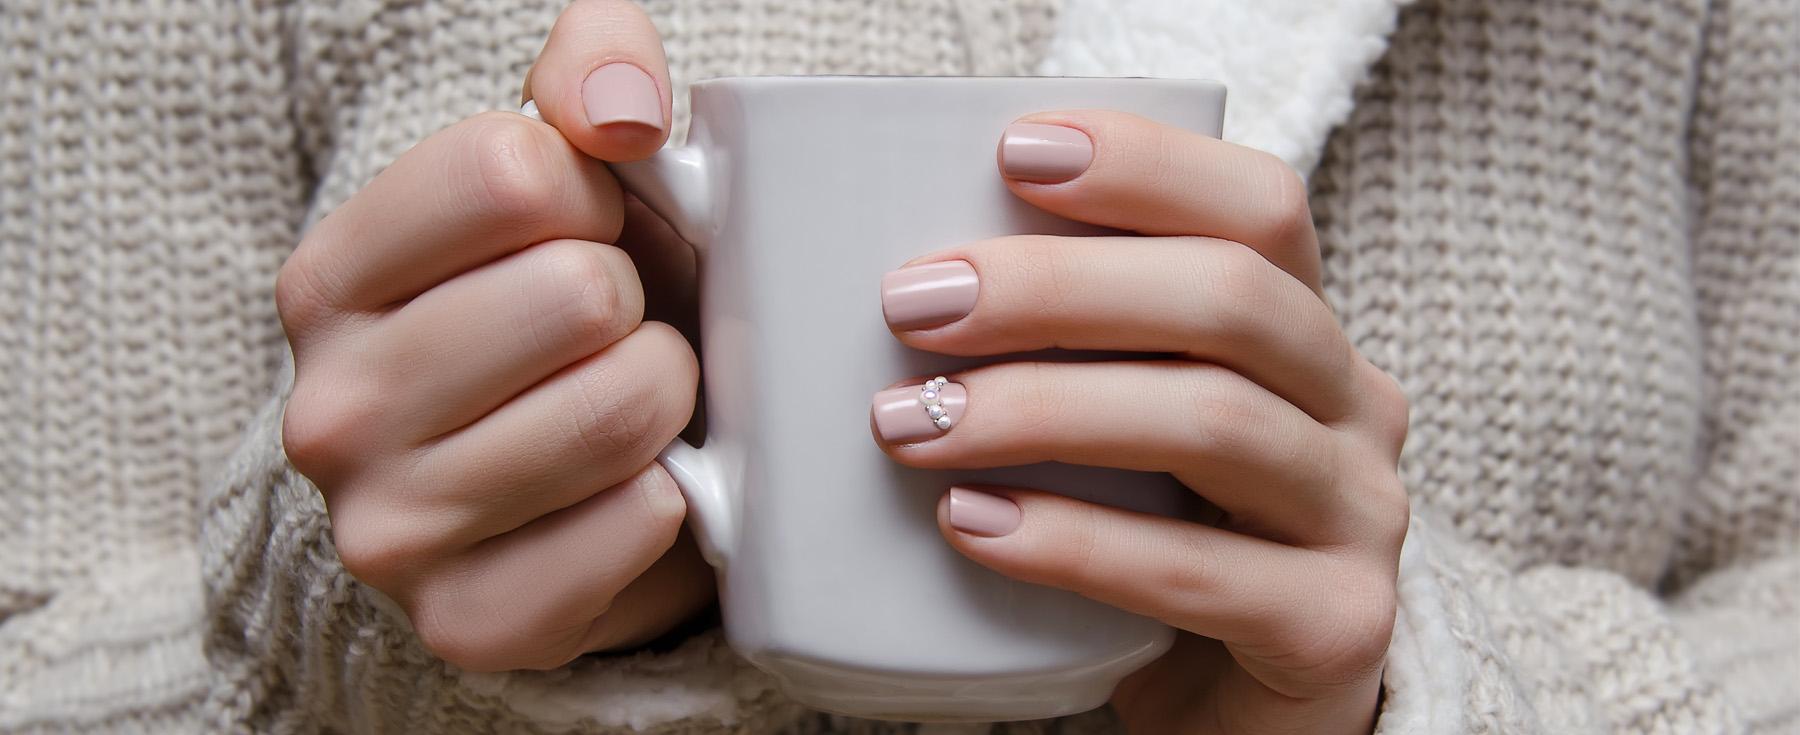 Hey Twinkle-Toes, Here\'s Some Vegan Nail Polish! : Ecorazzi